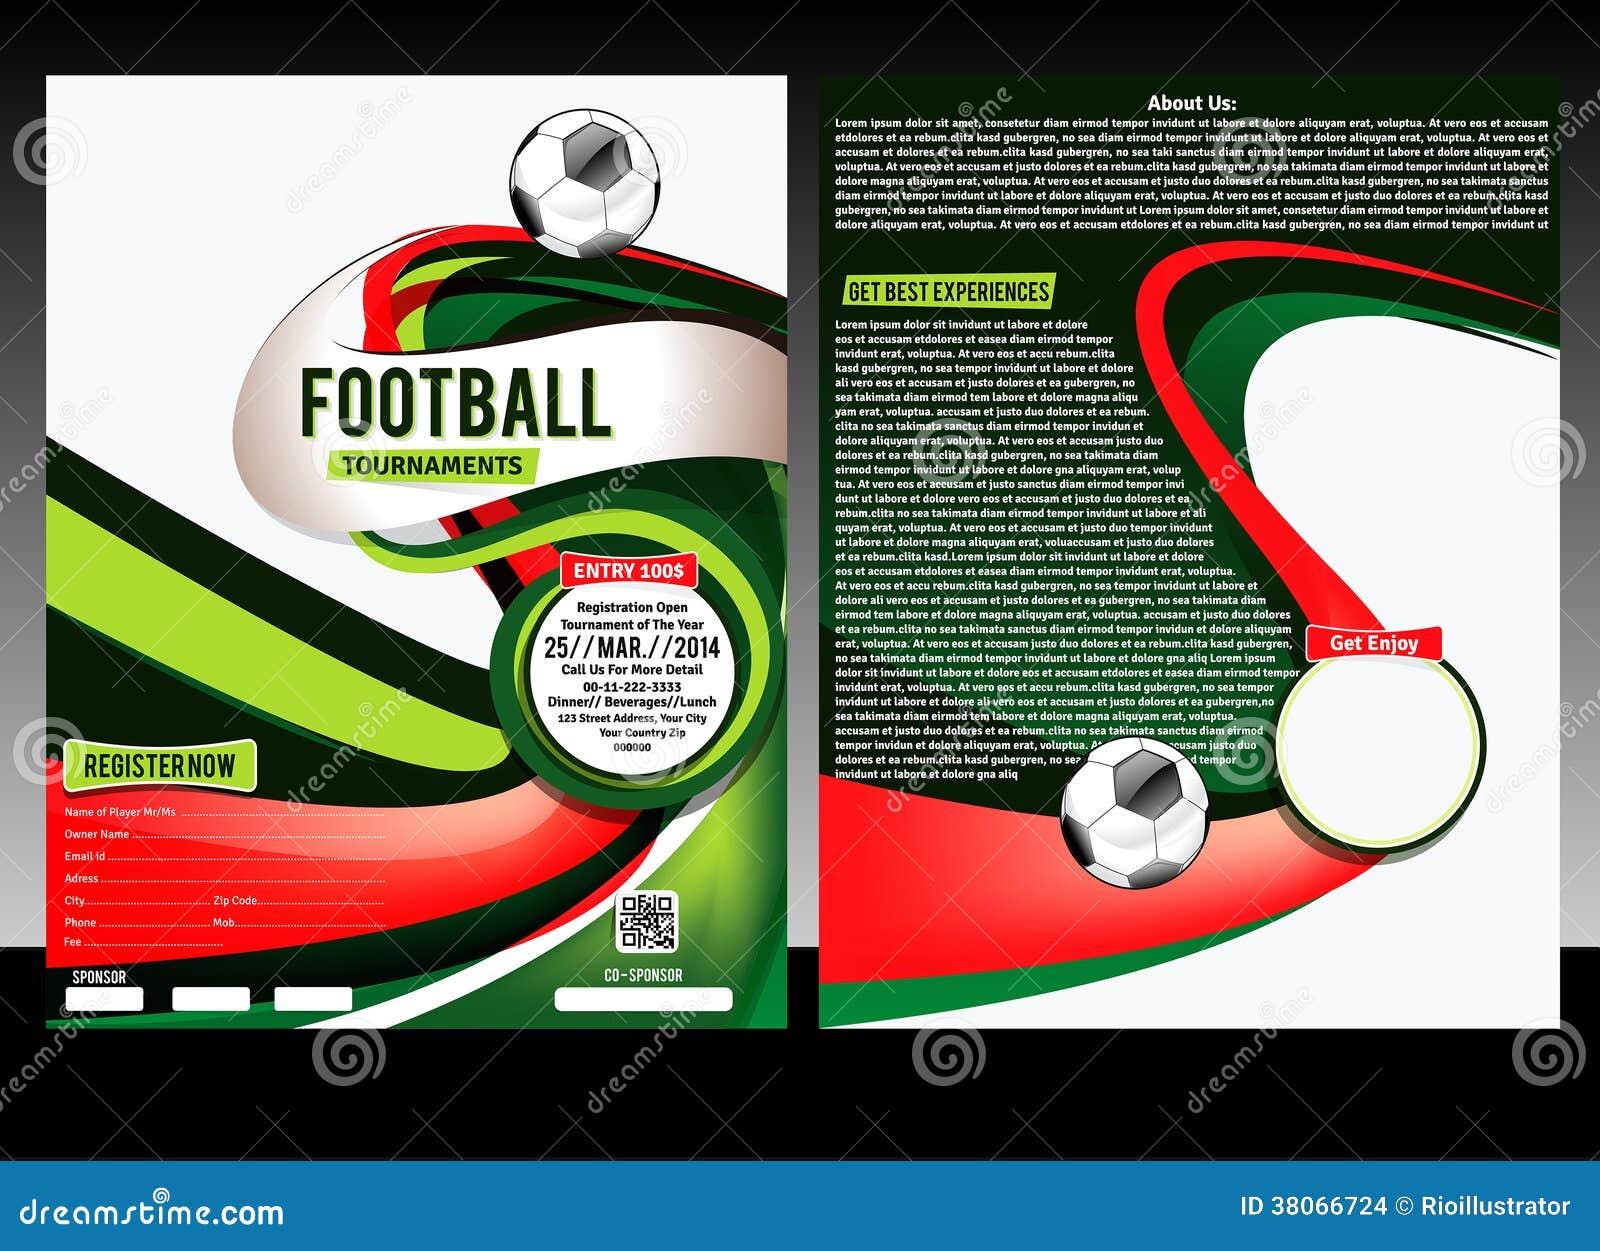 football flyer template stock illustration image  football flyer template stock images